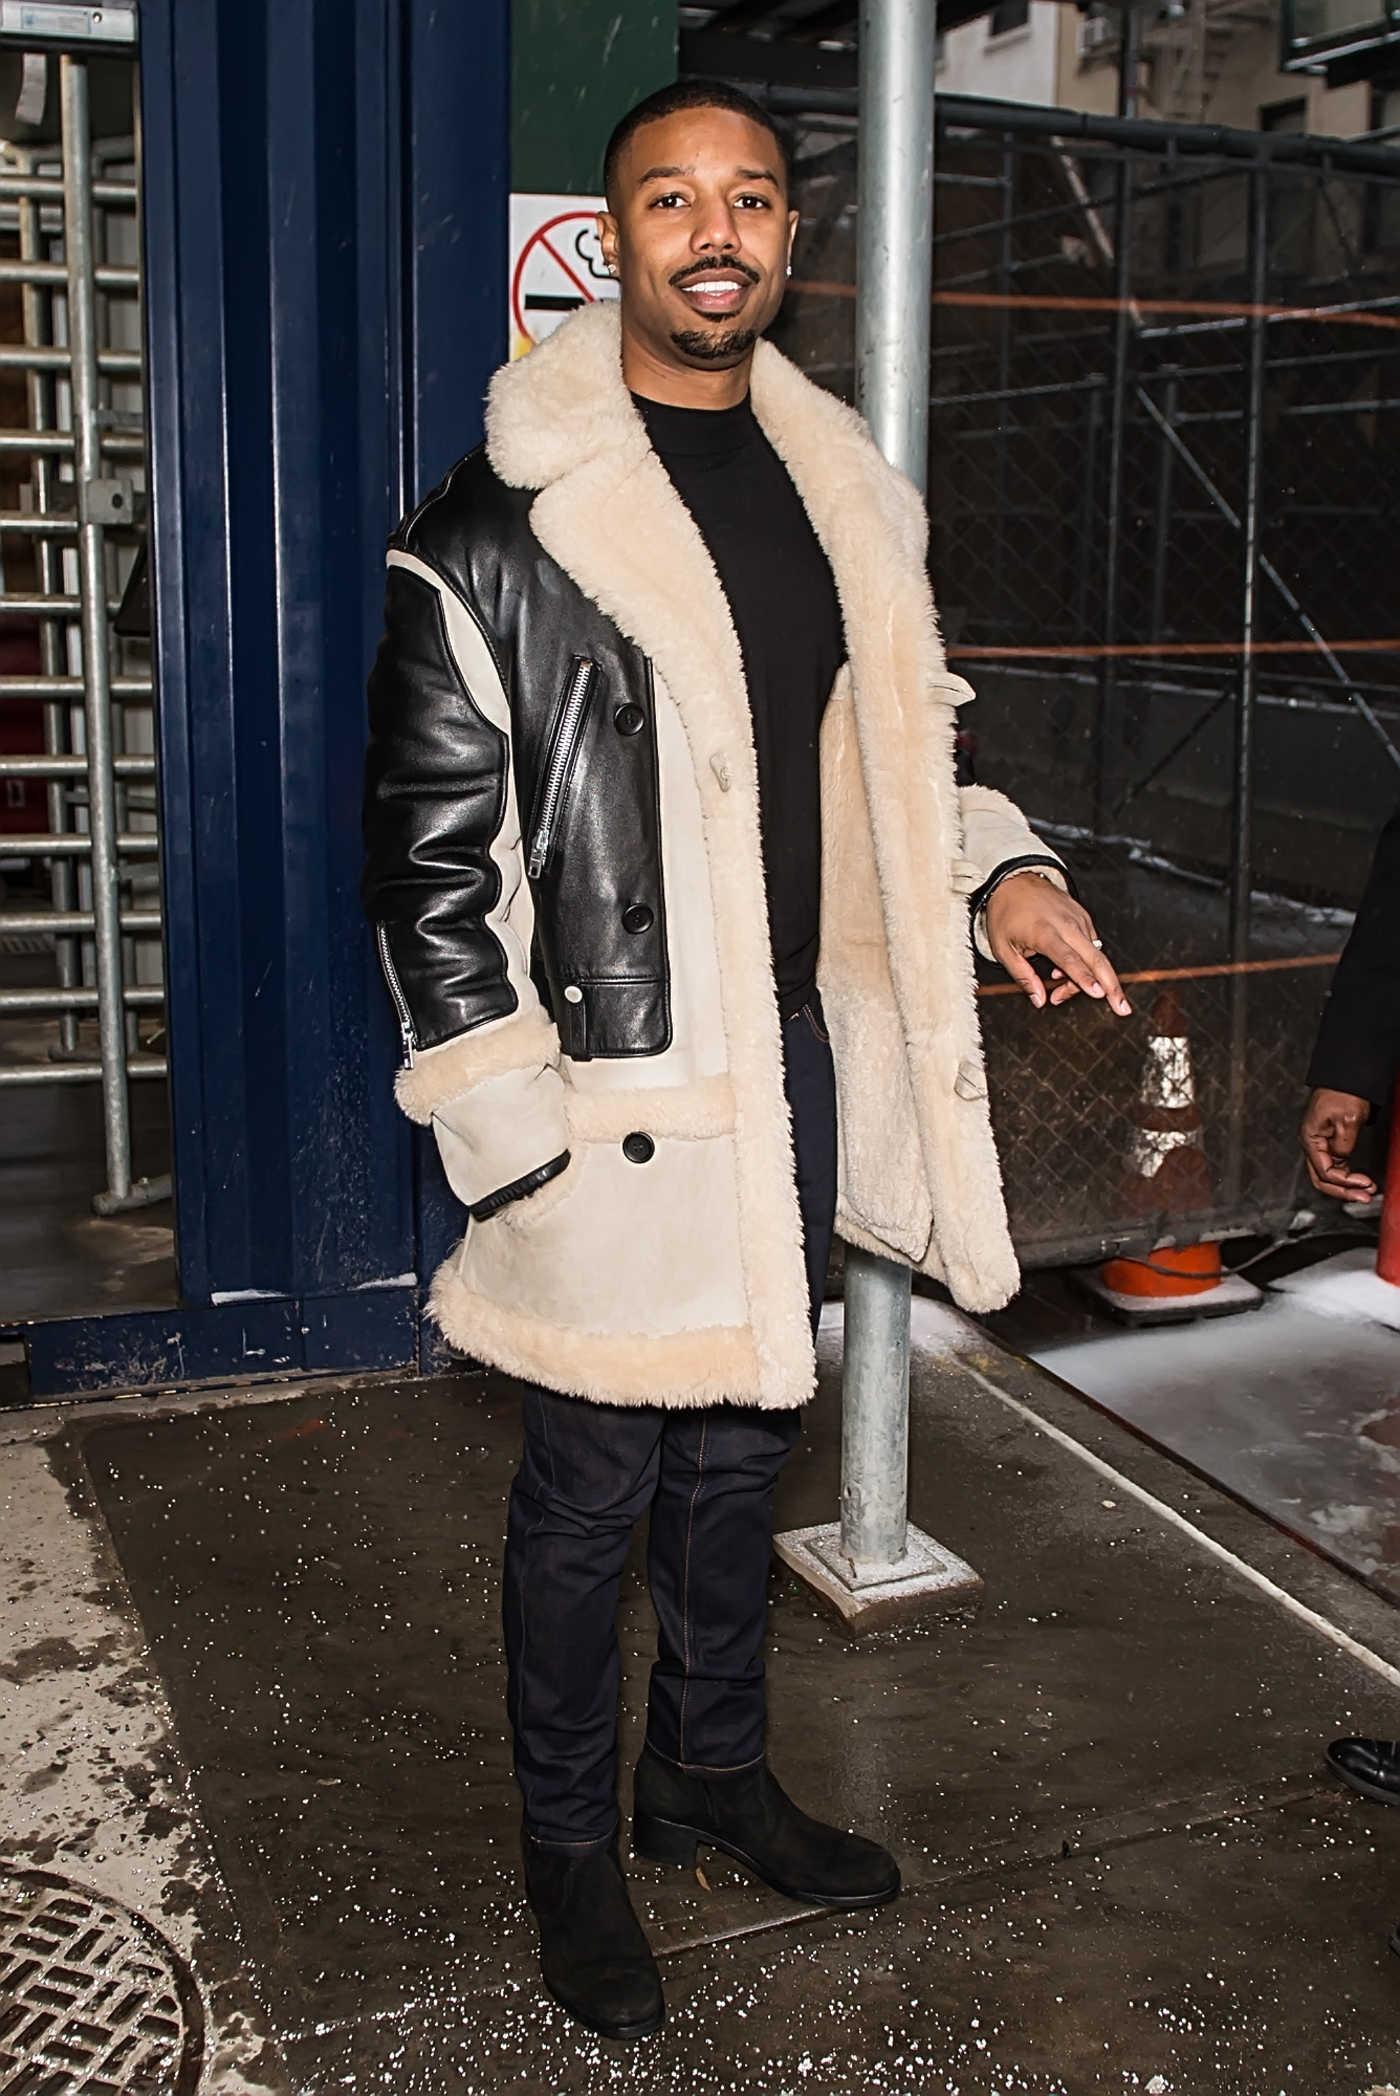 Michael B Jordan in a Sheepskin Coat Was Seen During NYFW in NYC 02/12/2019